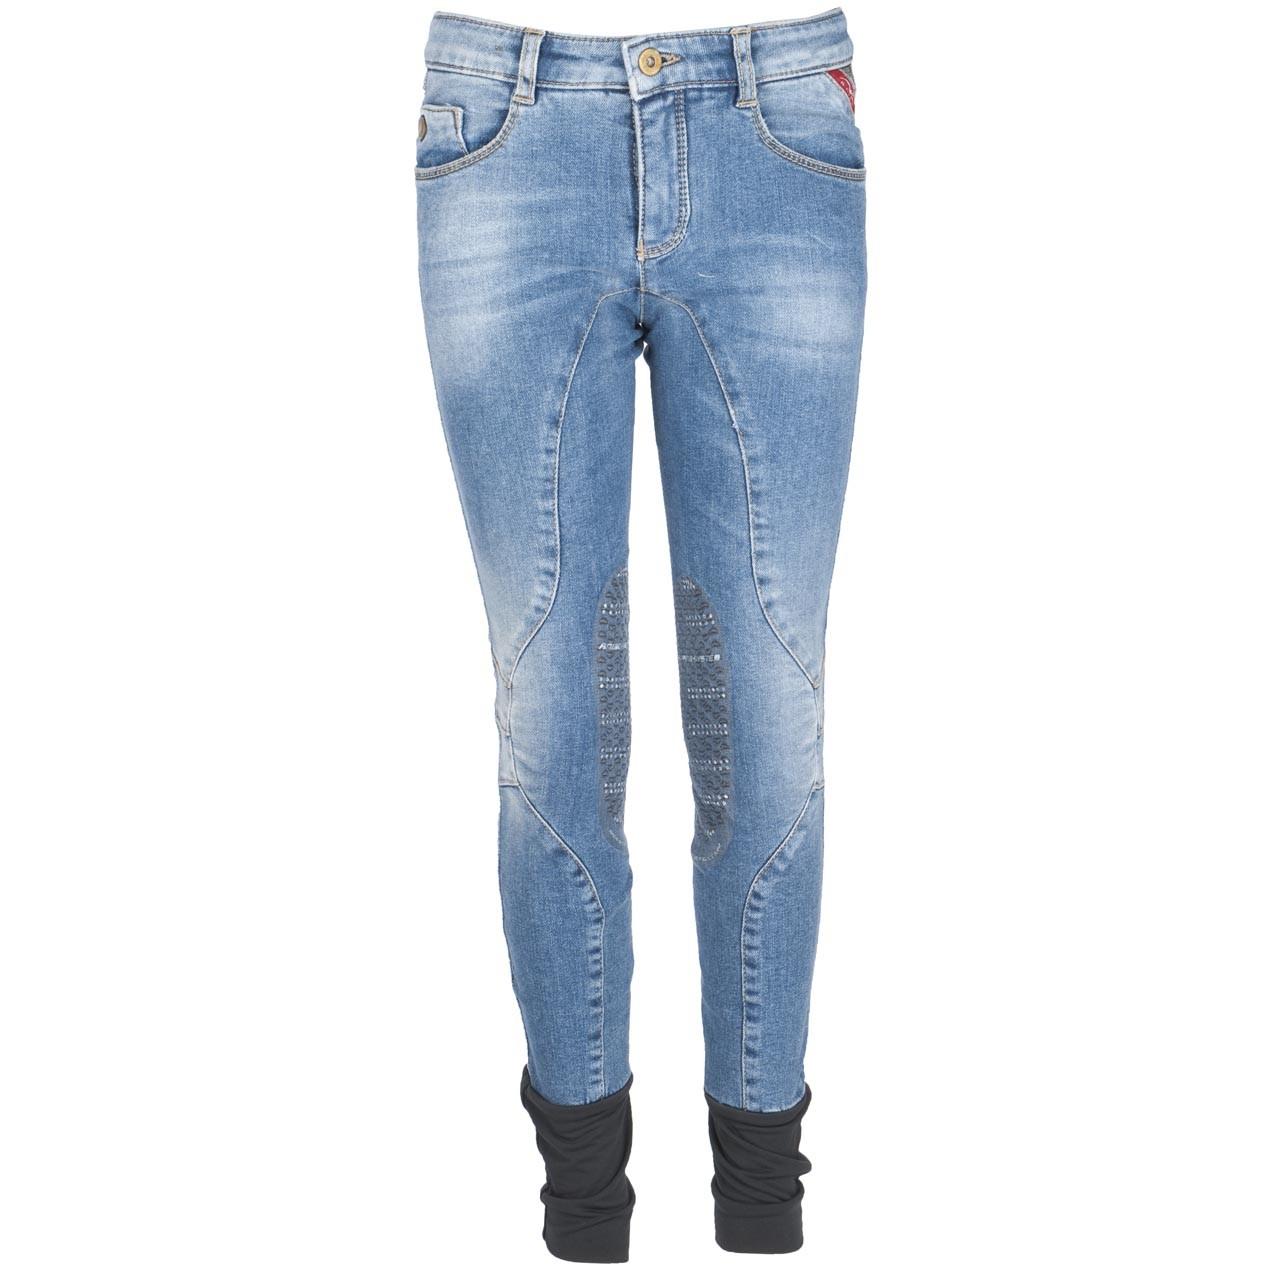 Animo Marnix kinder paardrijbroek jeans maat:140